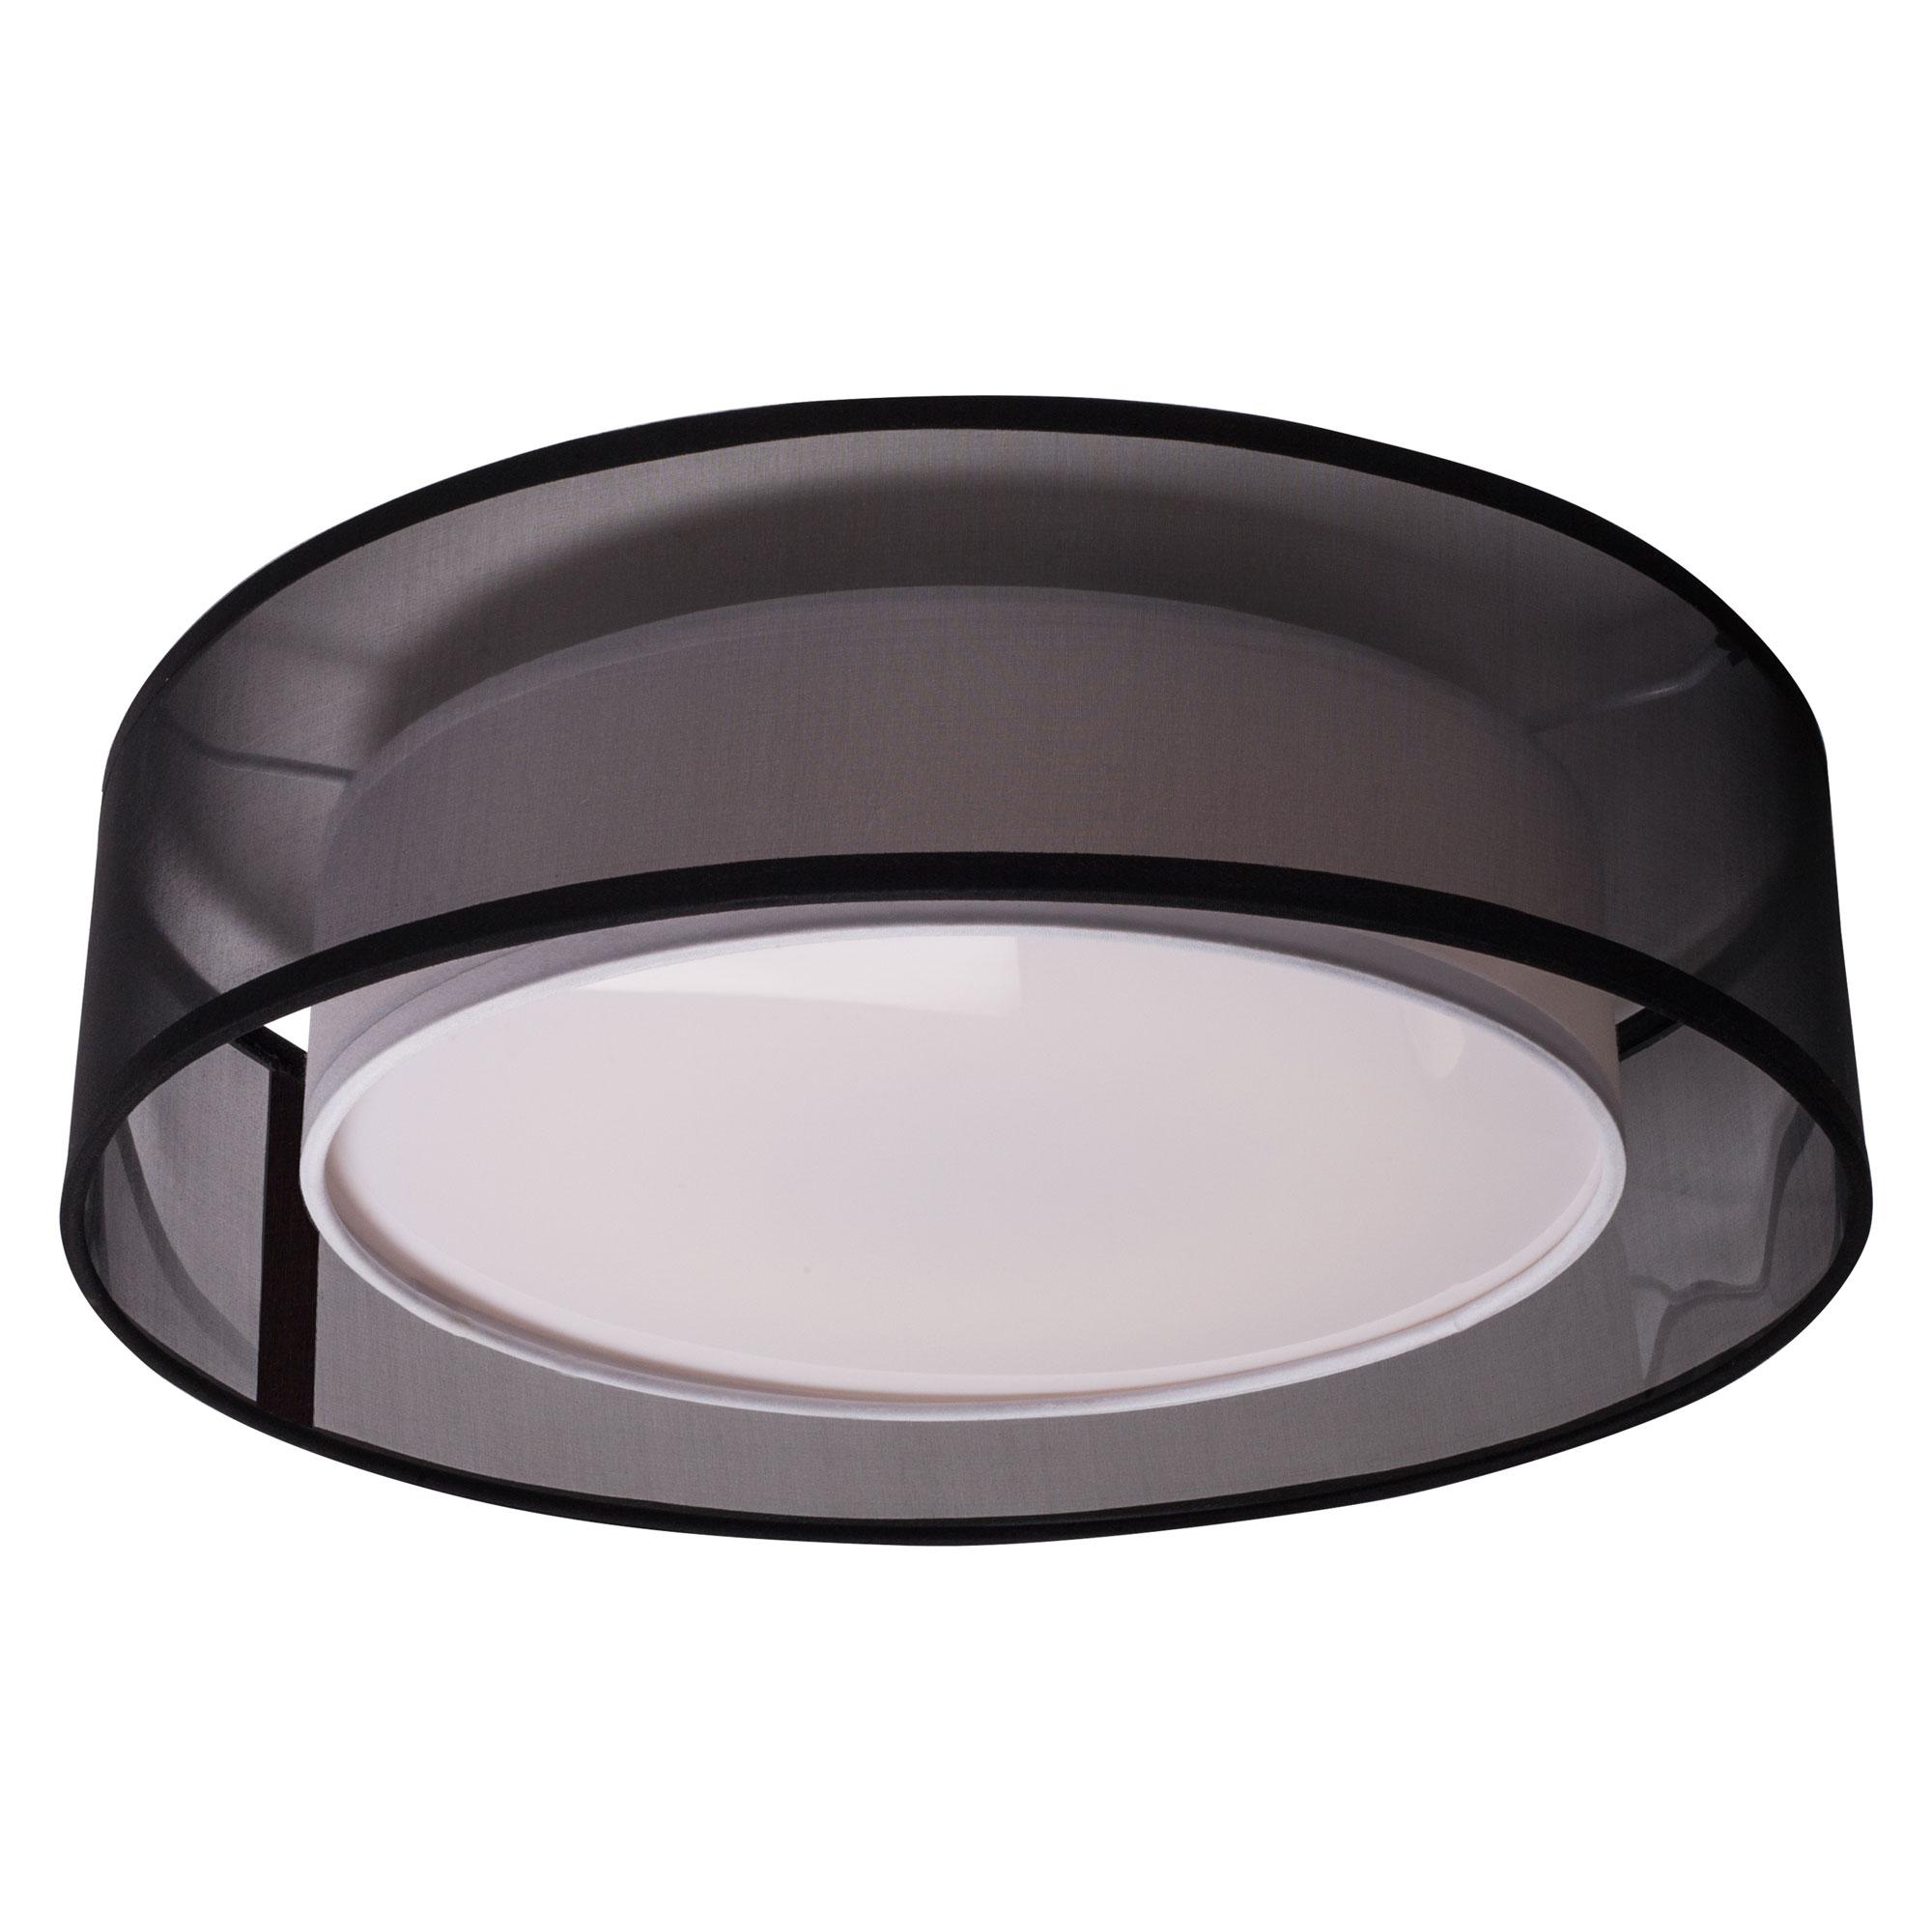 Covina Round Ceiling Light Fixture by Kuzco Lighting | FM11415-BK